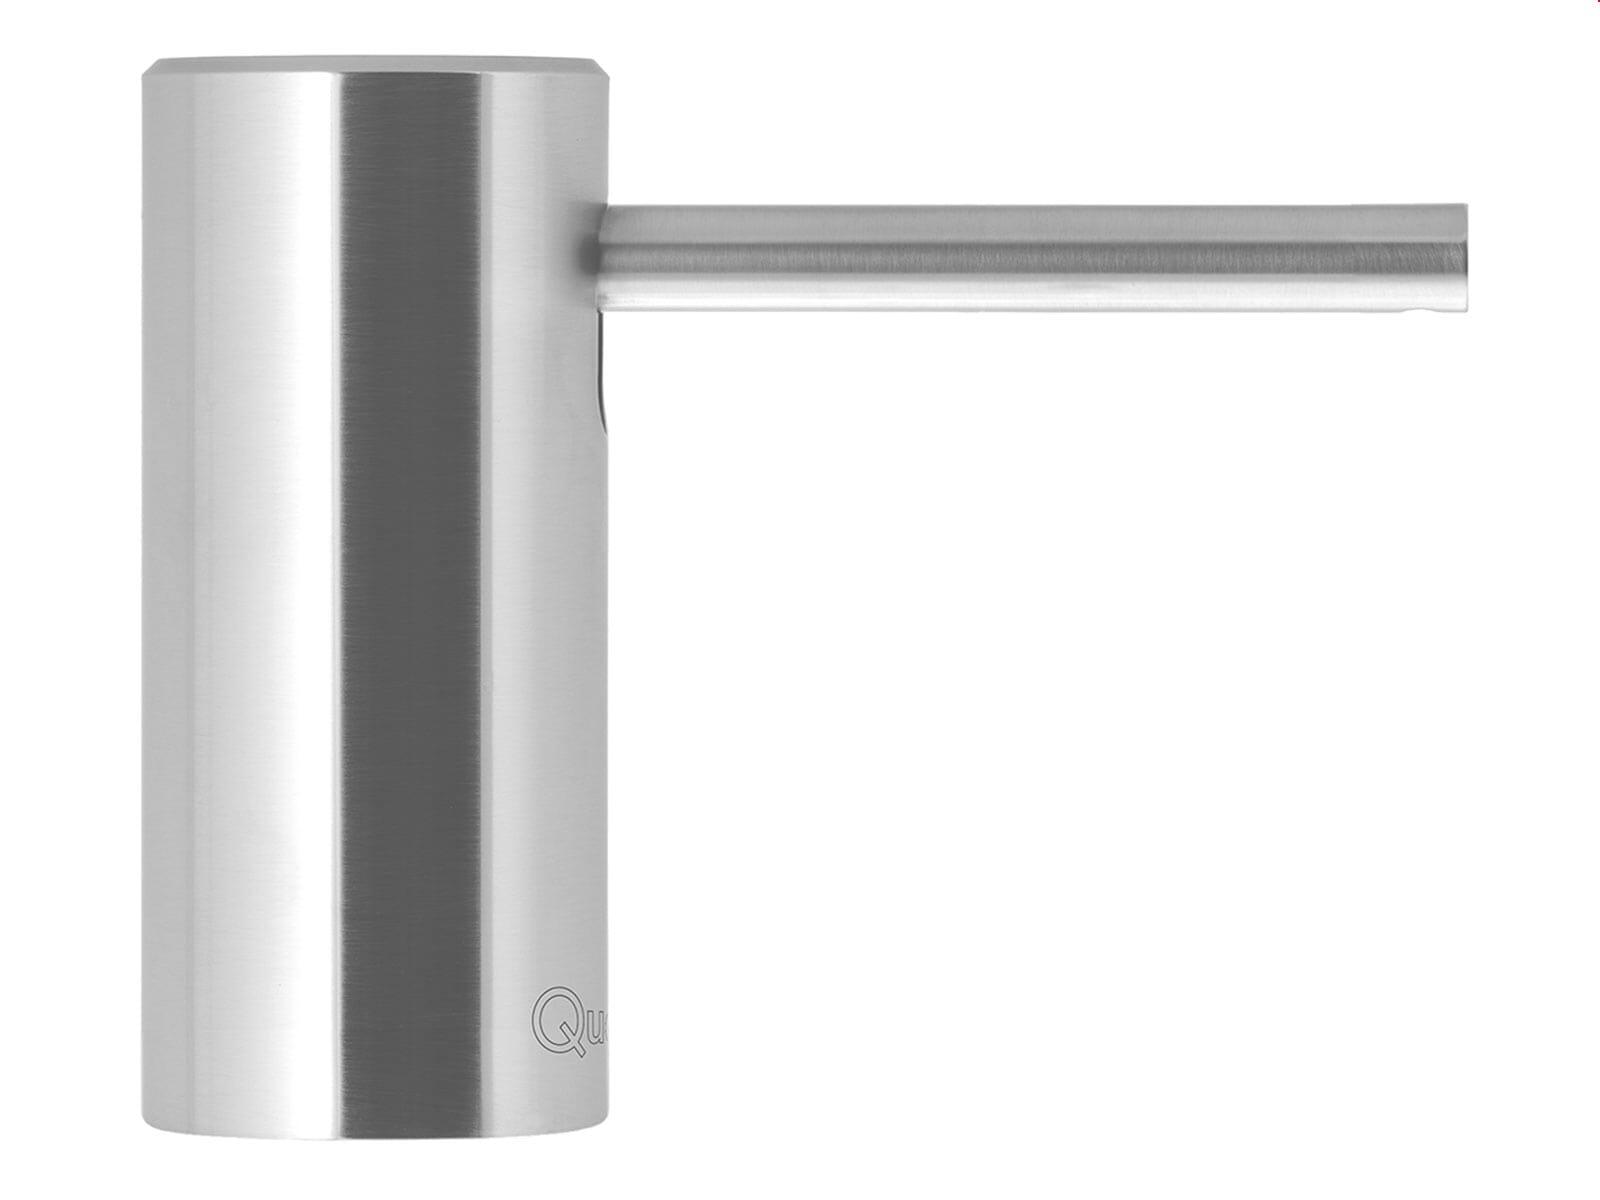 QUOOKER Nordic Seifenspender RVS (Voll-Edelstahl) / 55 mm